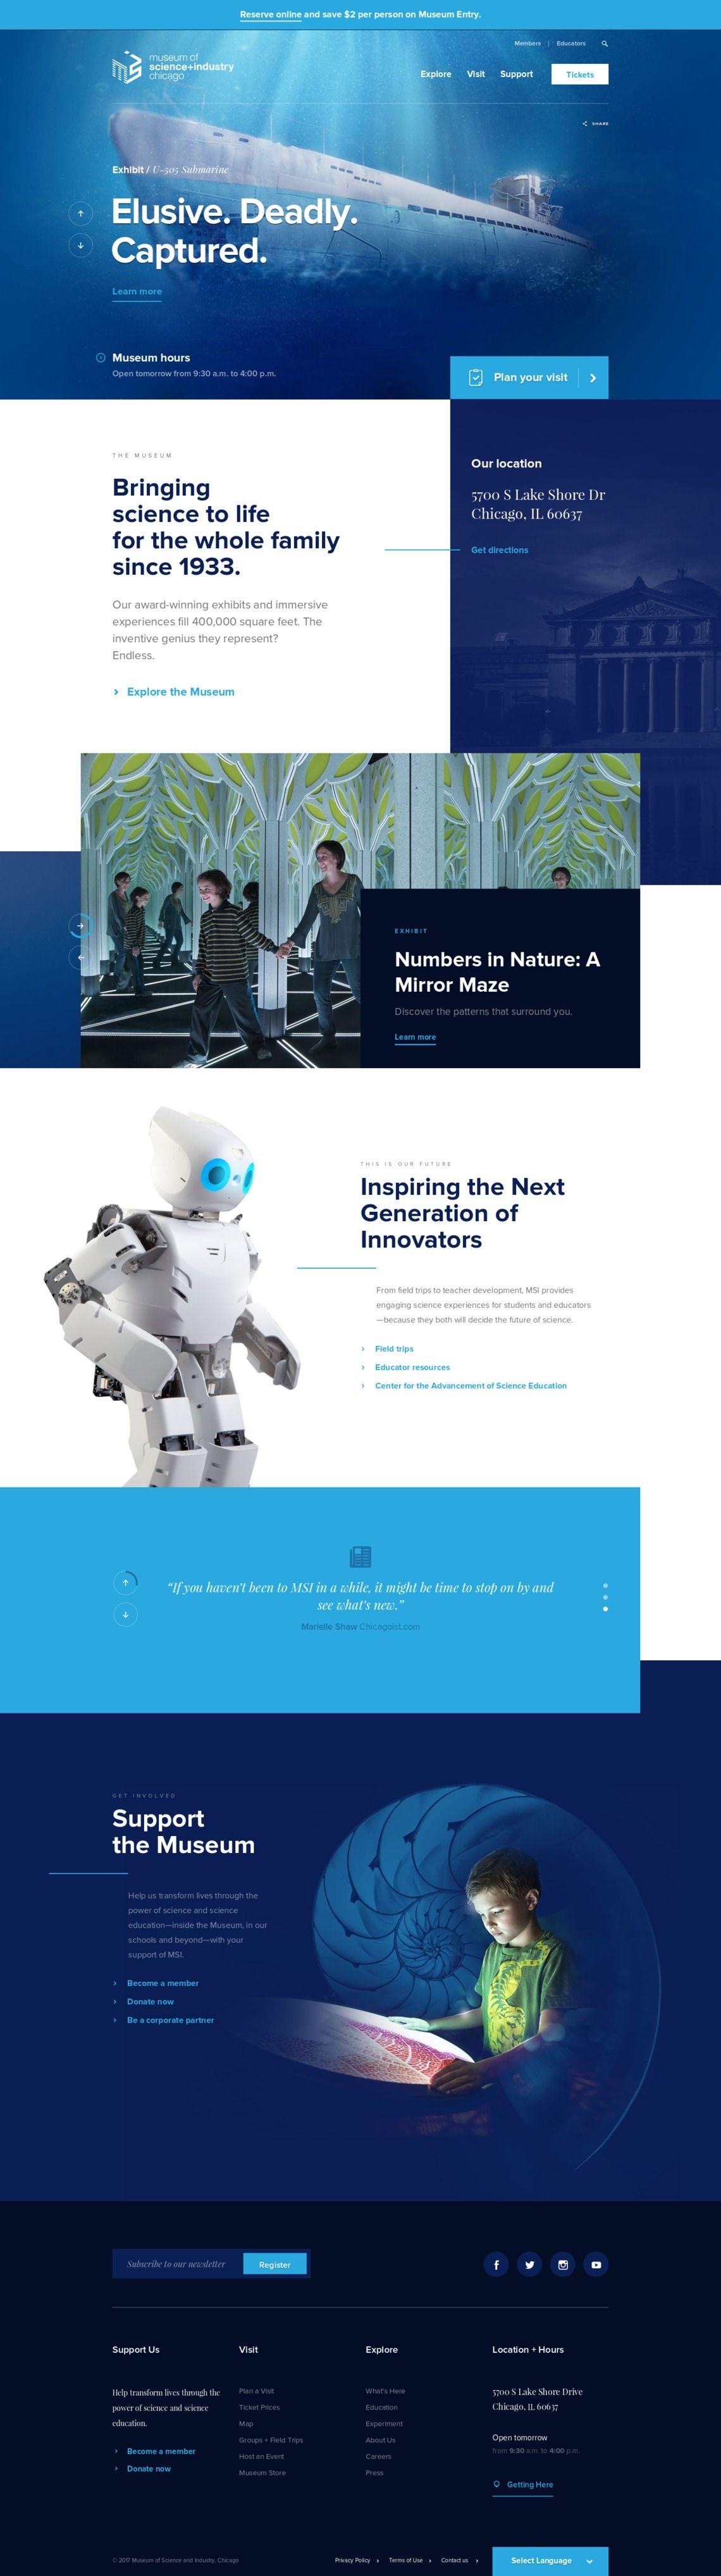 Delivery Services Website Theme Corporate Website Design Homepage Design Website Template Design